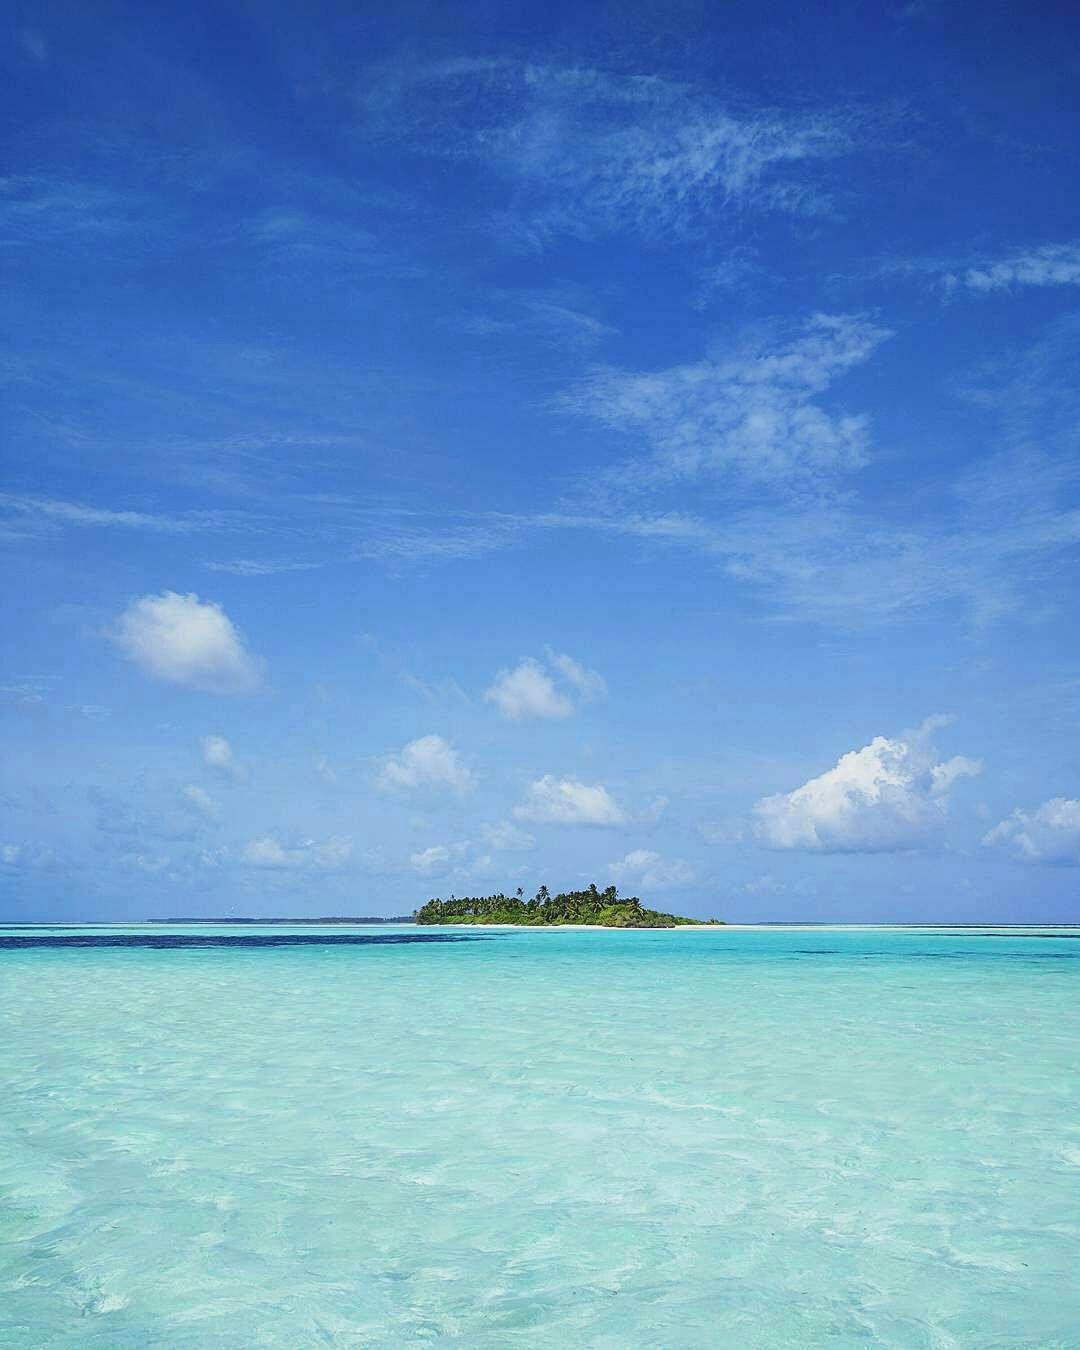 The Maldives Islands Maldives Photo Ismailnathij Holidays Turquoise Blue Vacation Stayinspired Travel Island Indianoce Mar Y Playa Dia De Playa Playa